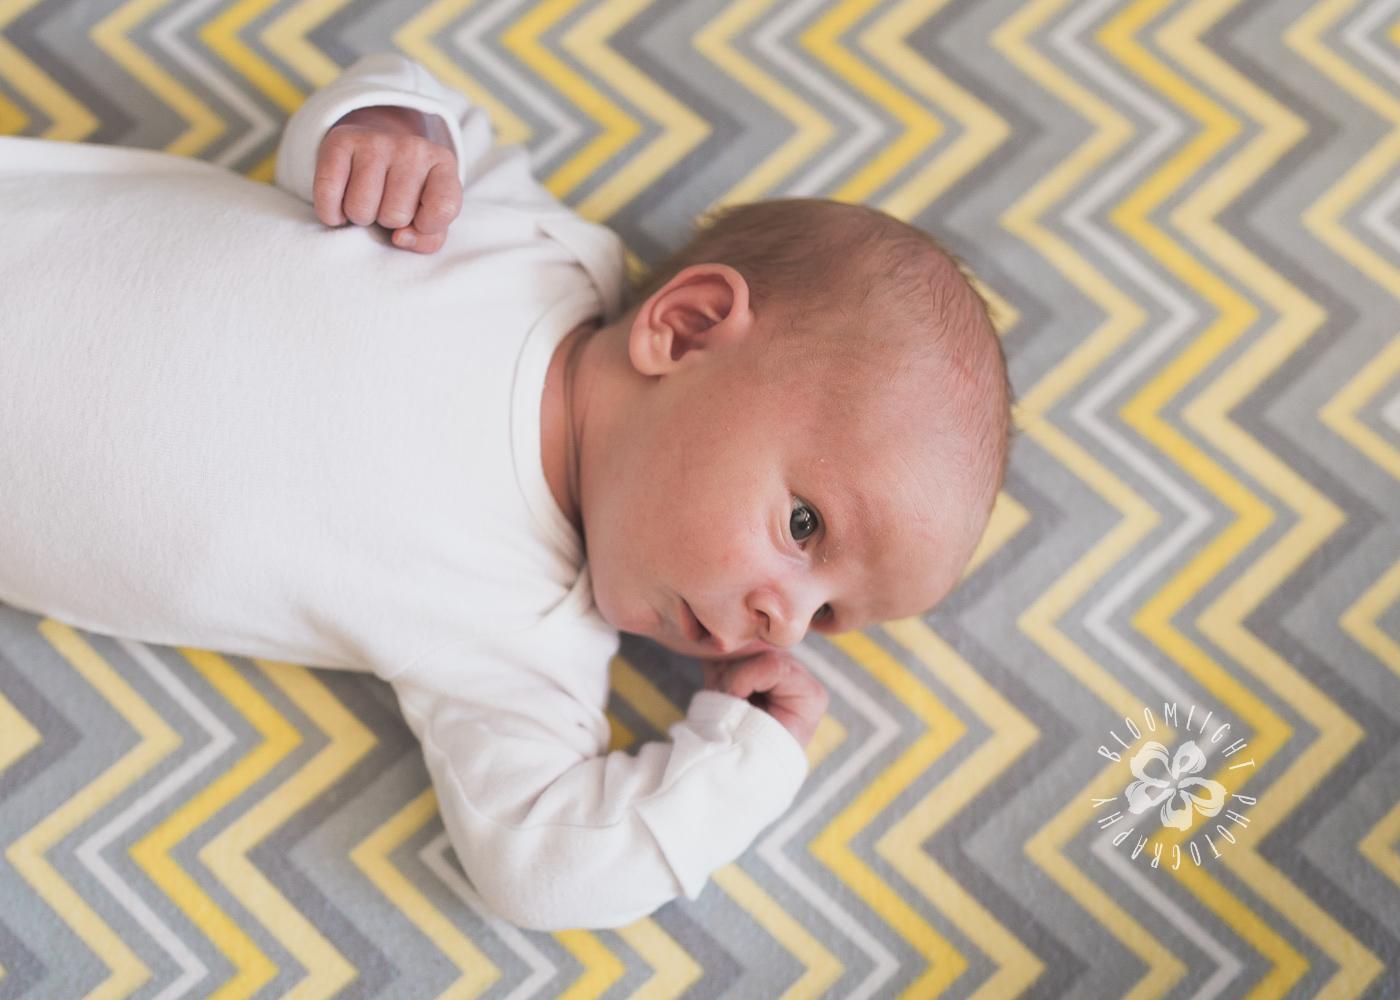 Newborn in his yellow and grey mattress